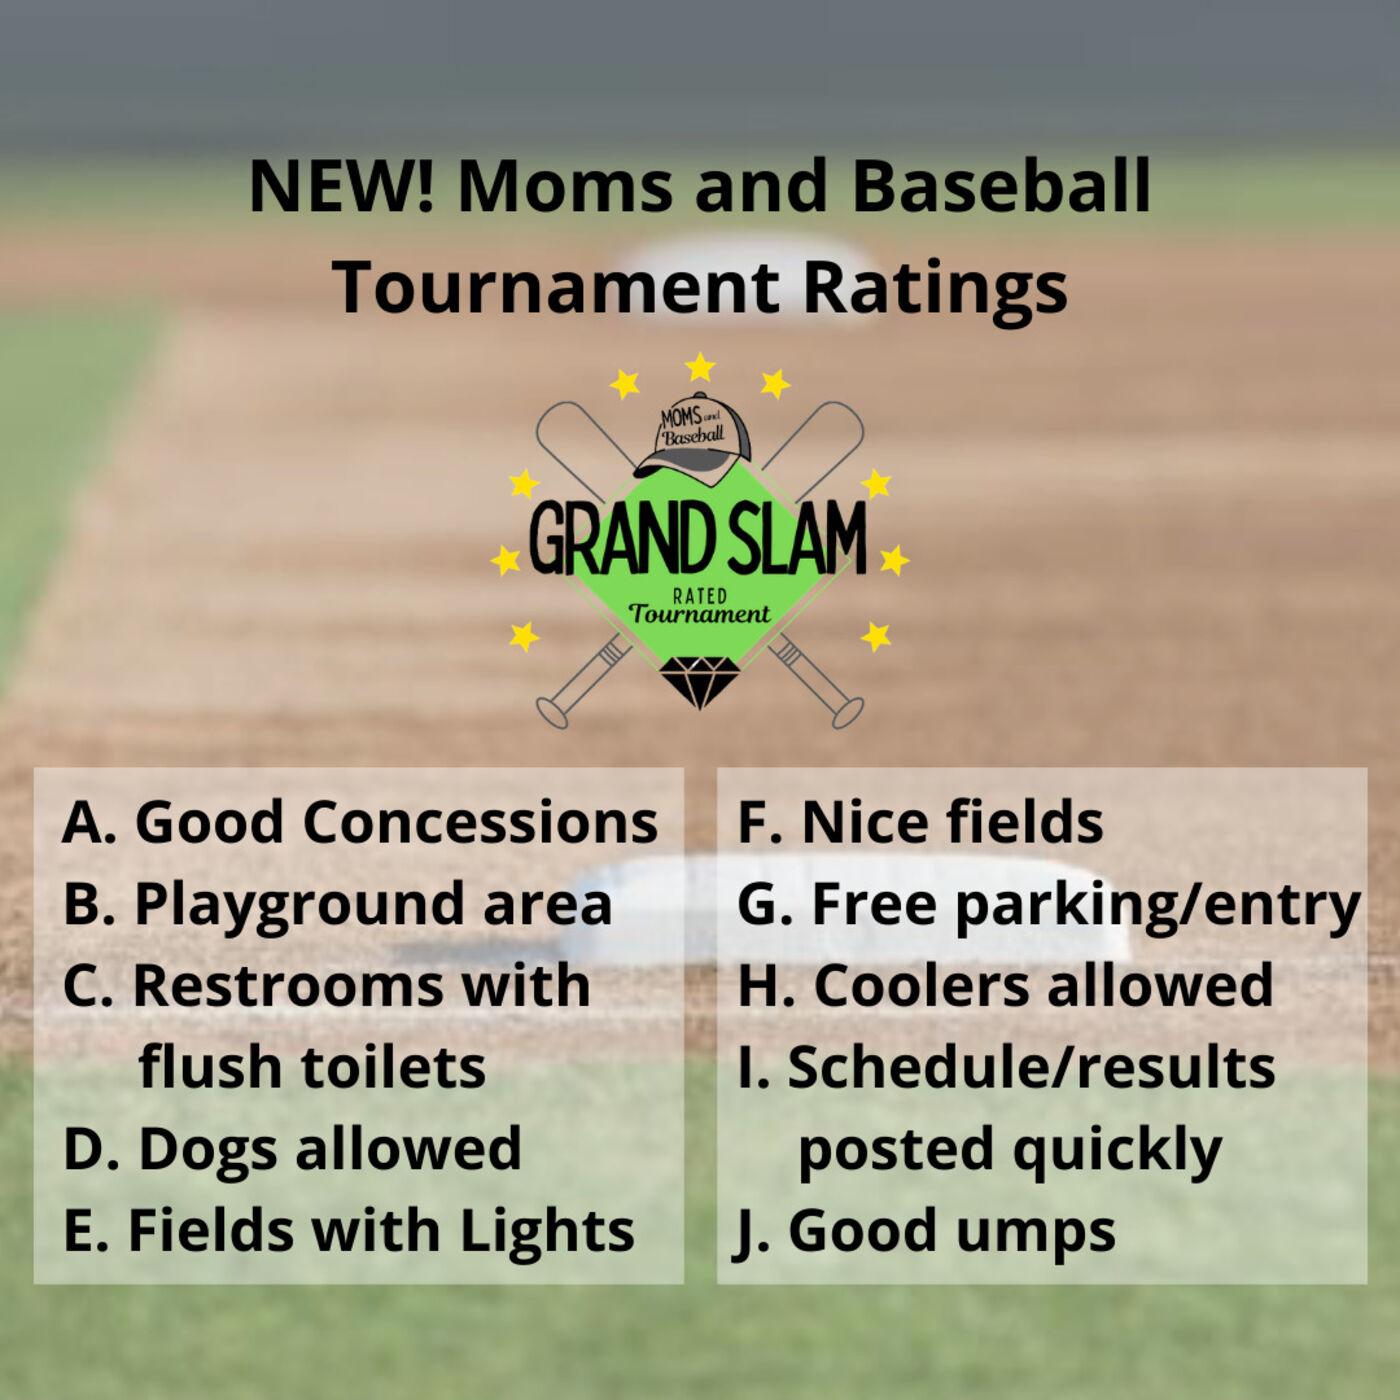 036: New! Moms and Baseball Tournament Ratings